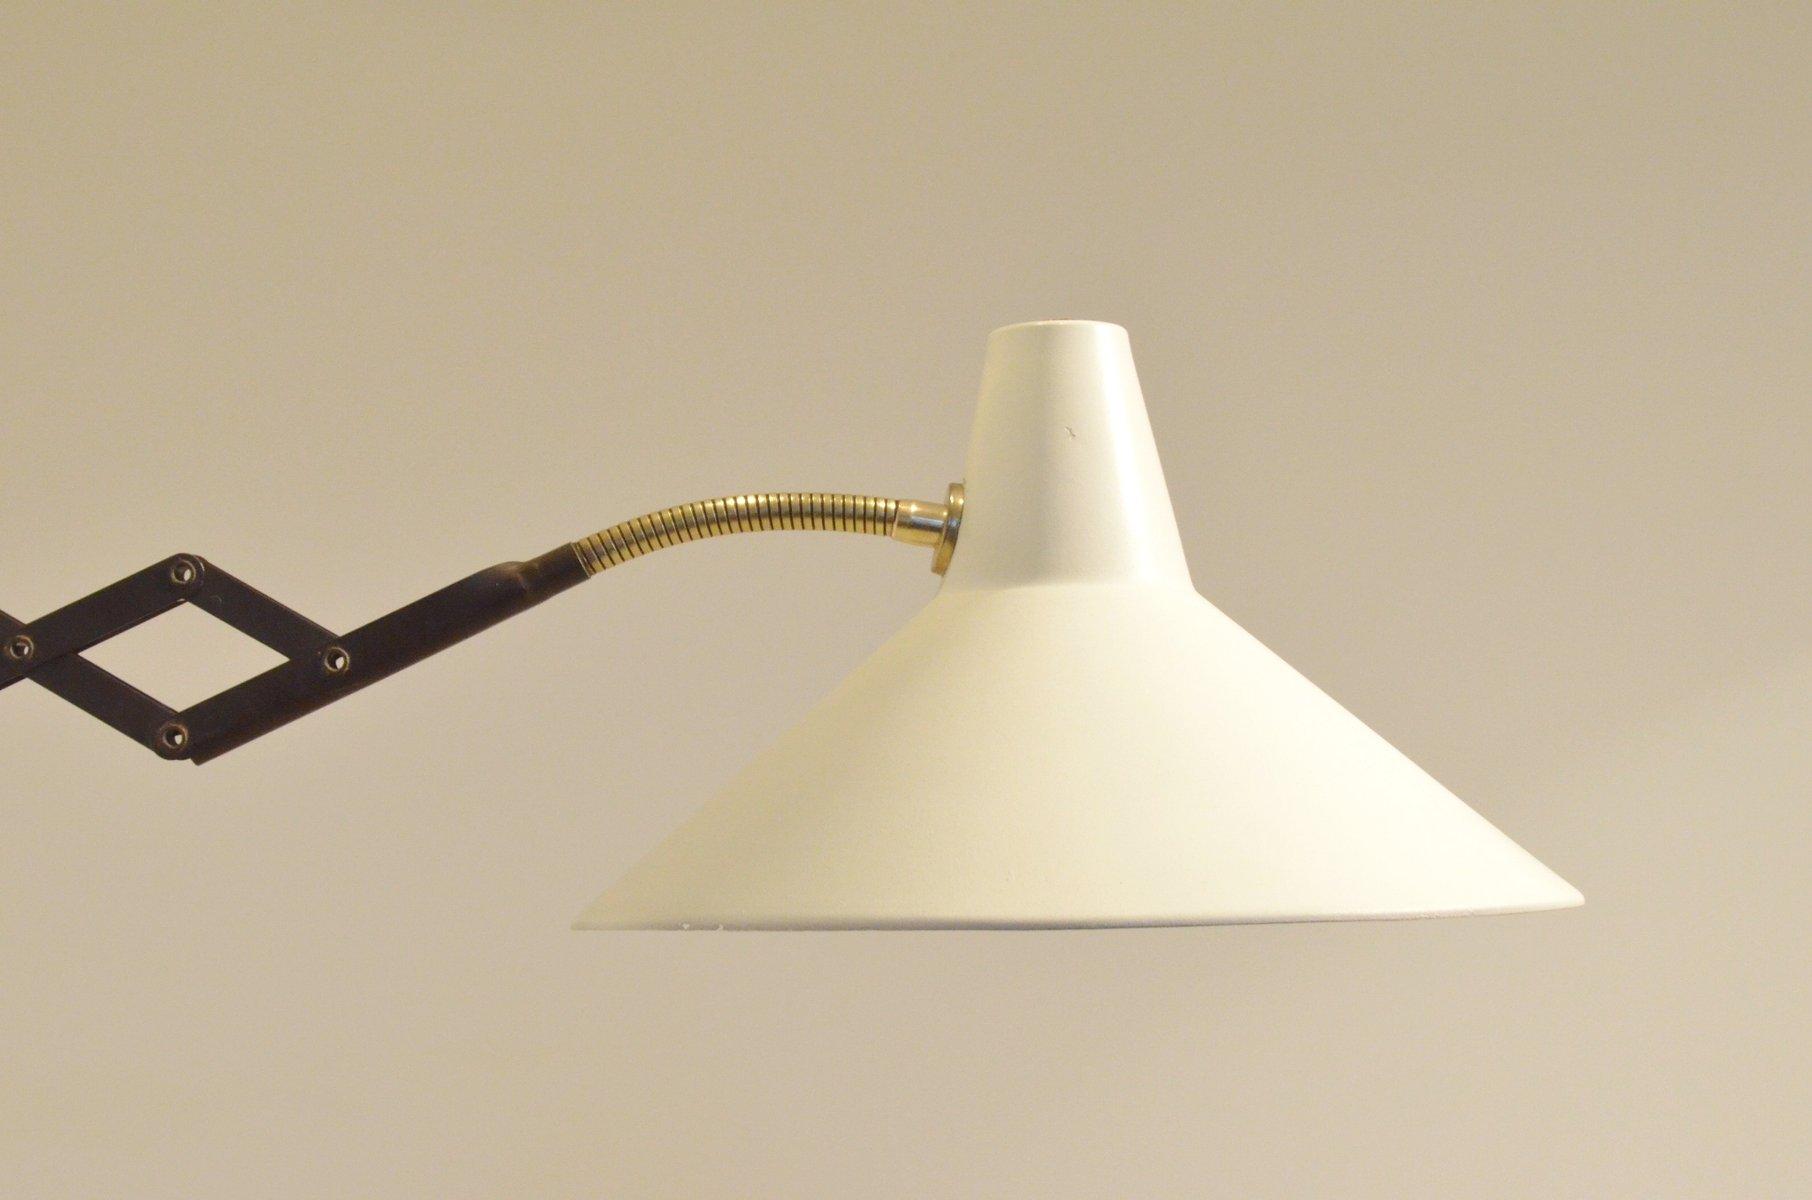 niederl ndische mid century lampe mit ziehharmonika gelenk. Black Bedroom Furniture Sets. Home Design Ideas